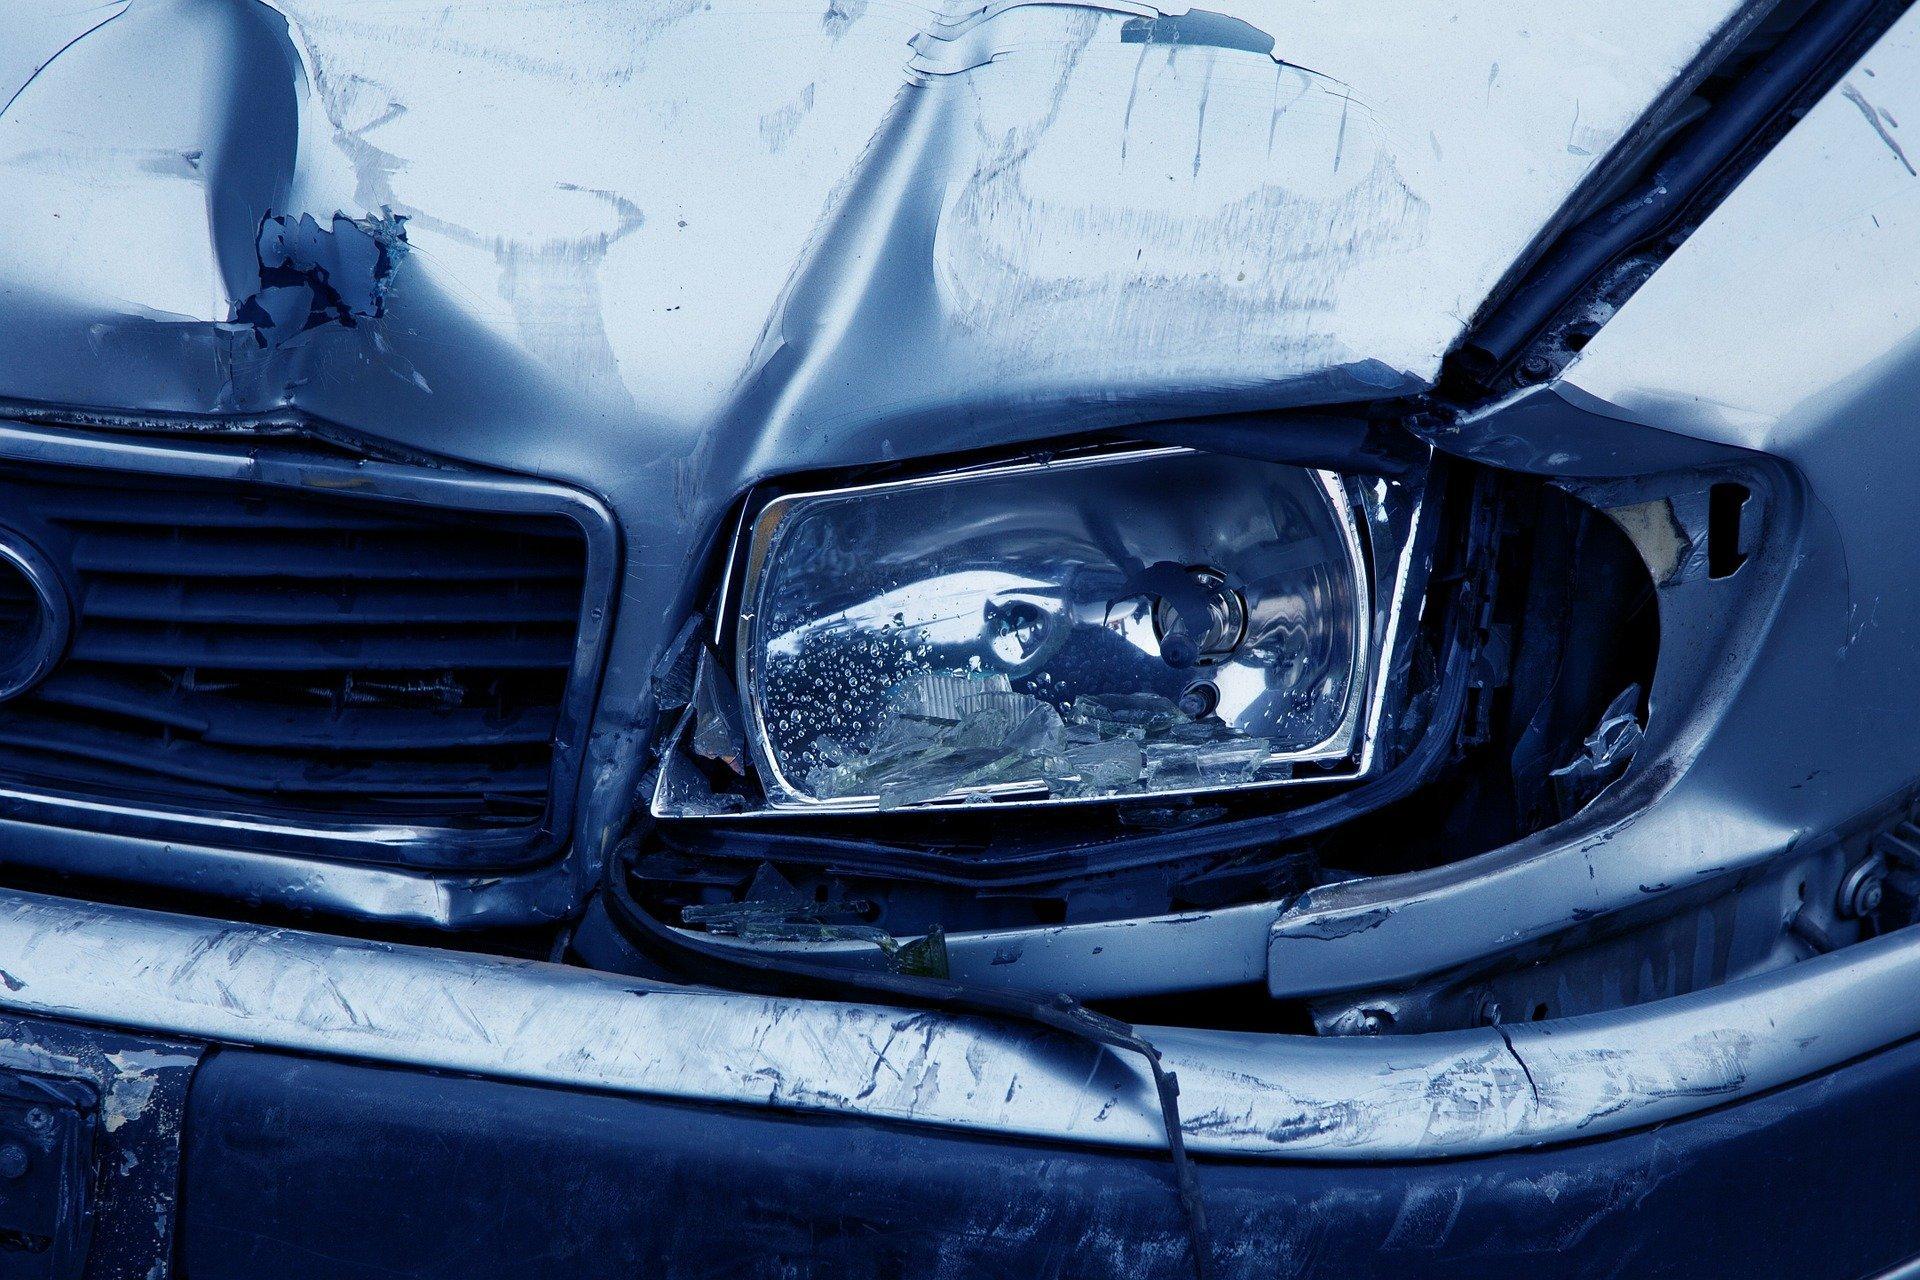 Phare d'une voiture accidentée | Source : Pixabay